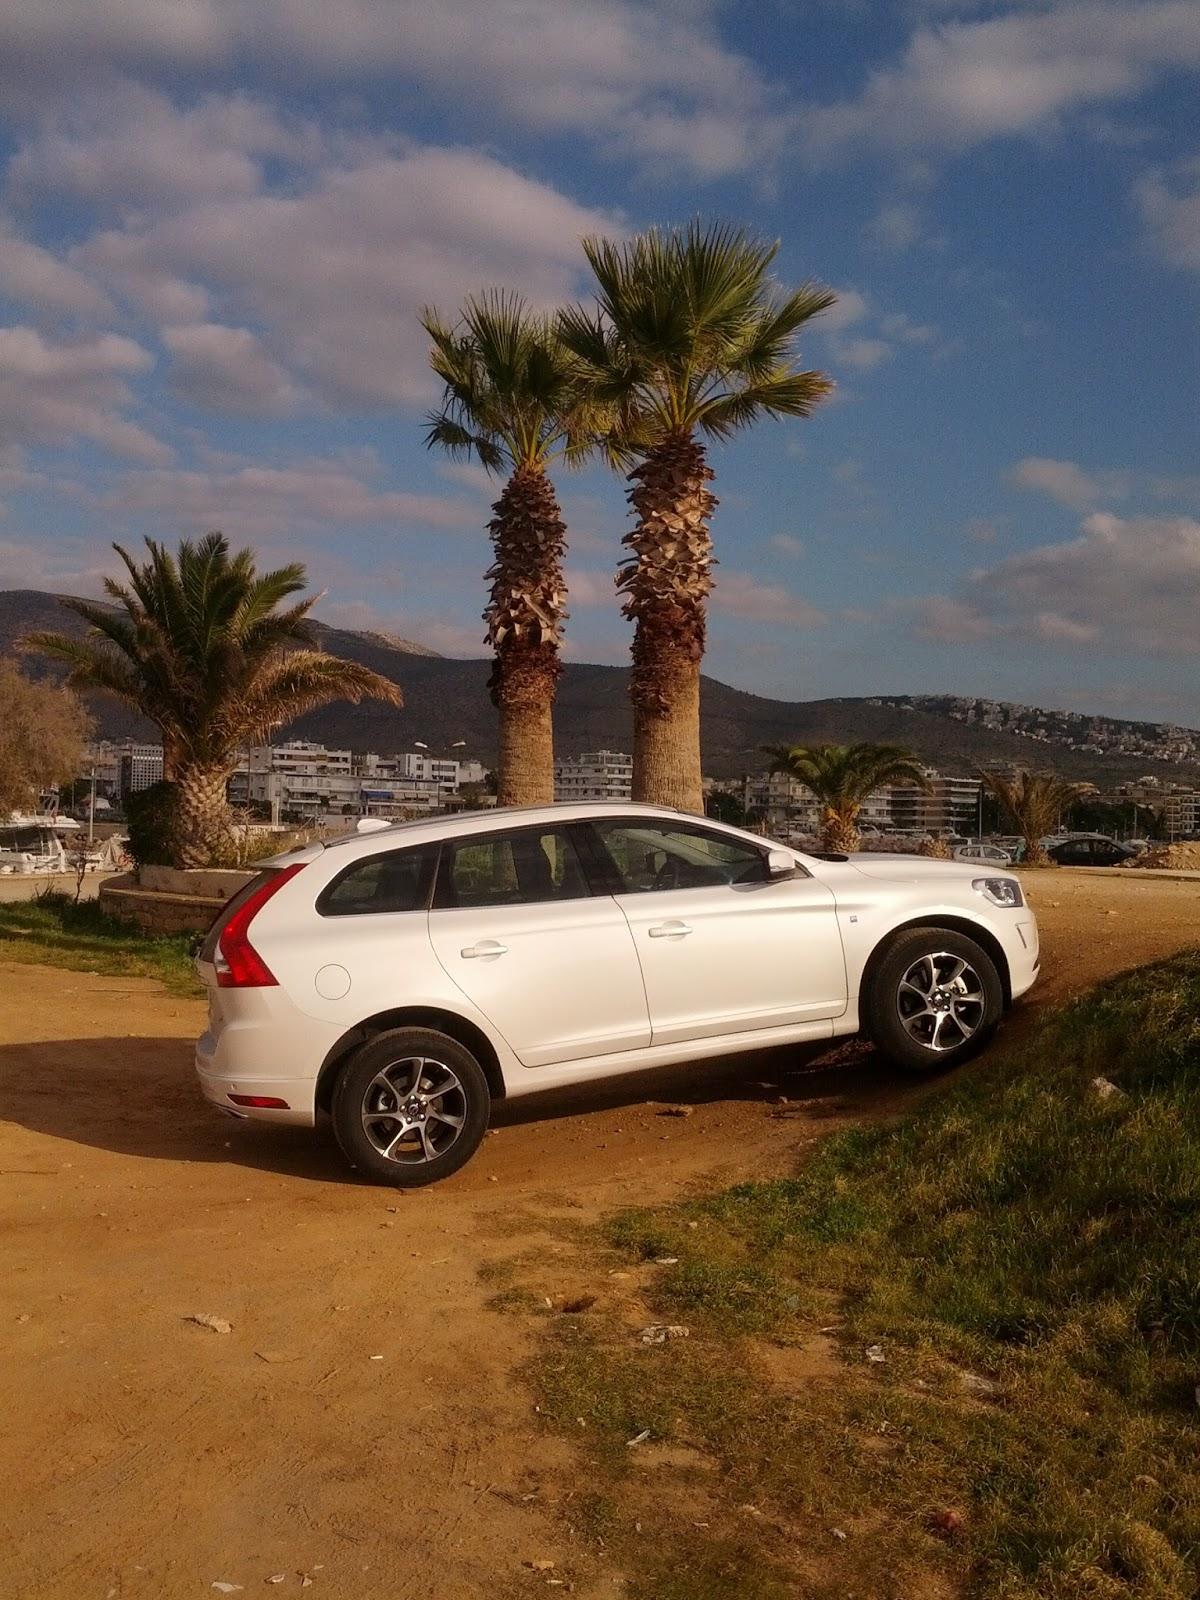 IMG 20151209 143024 Γιατί το Volvo XC60 είναι εθιστικό